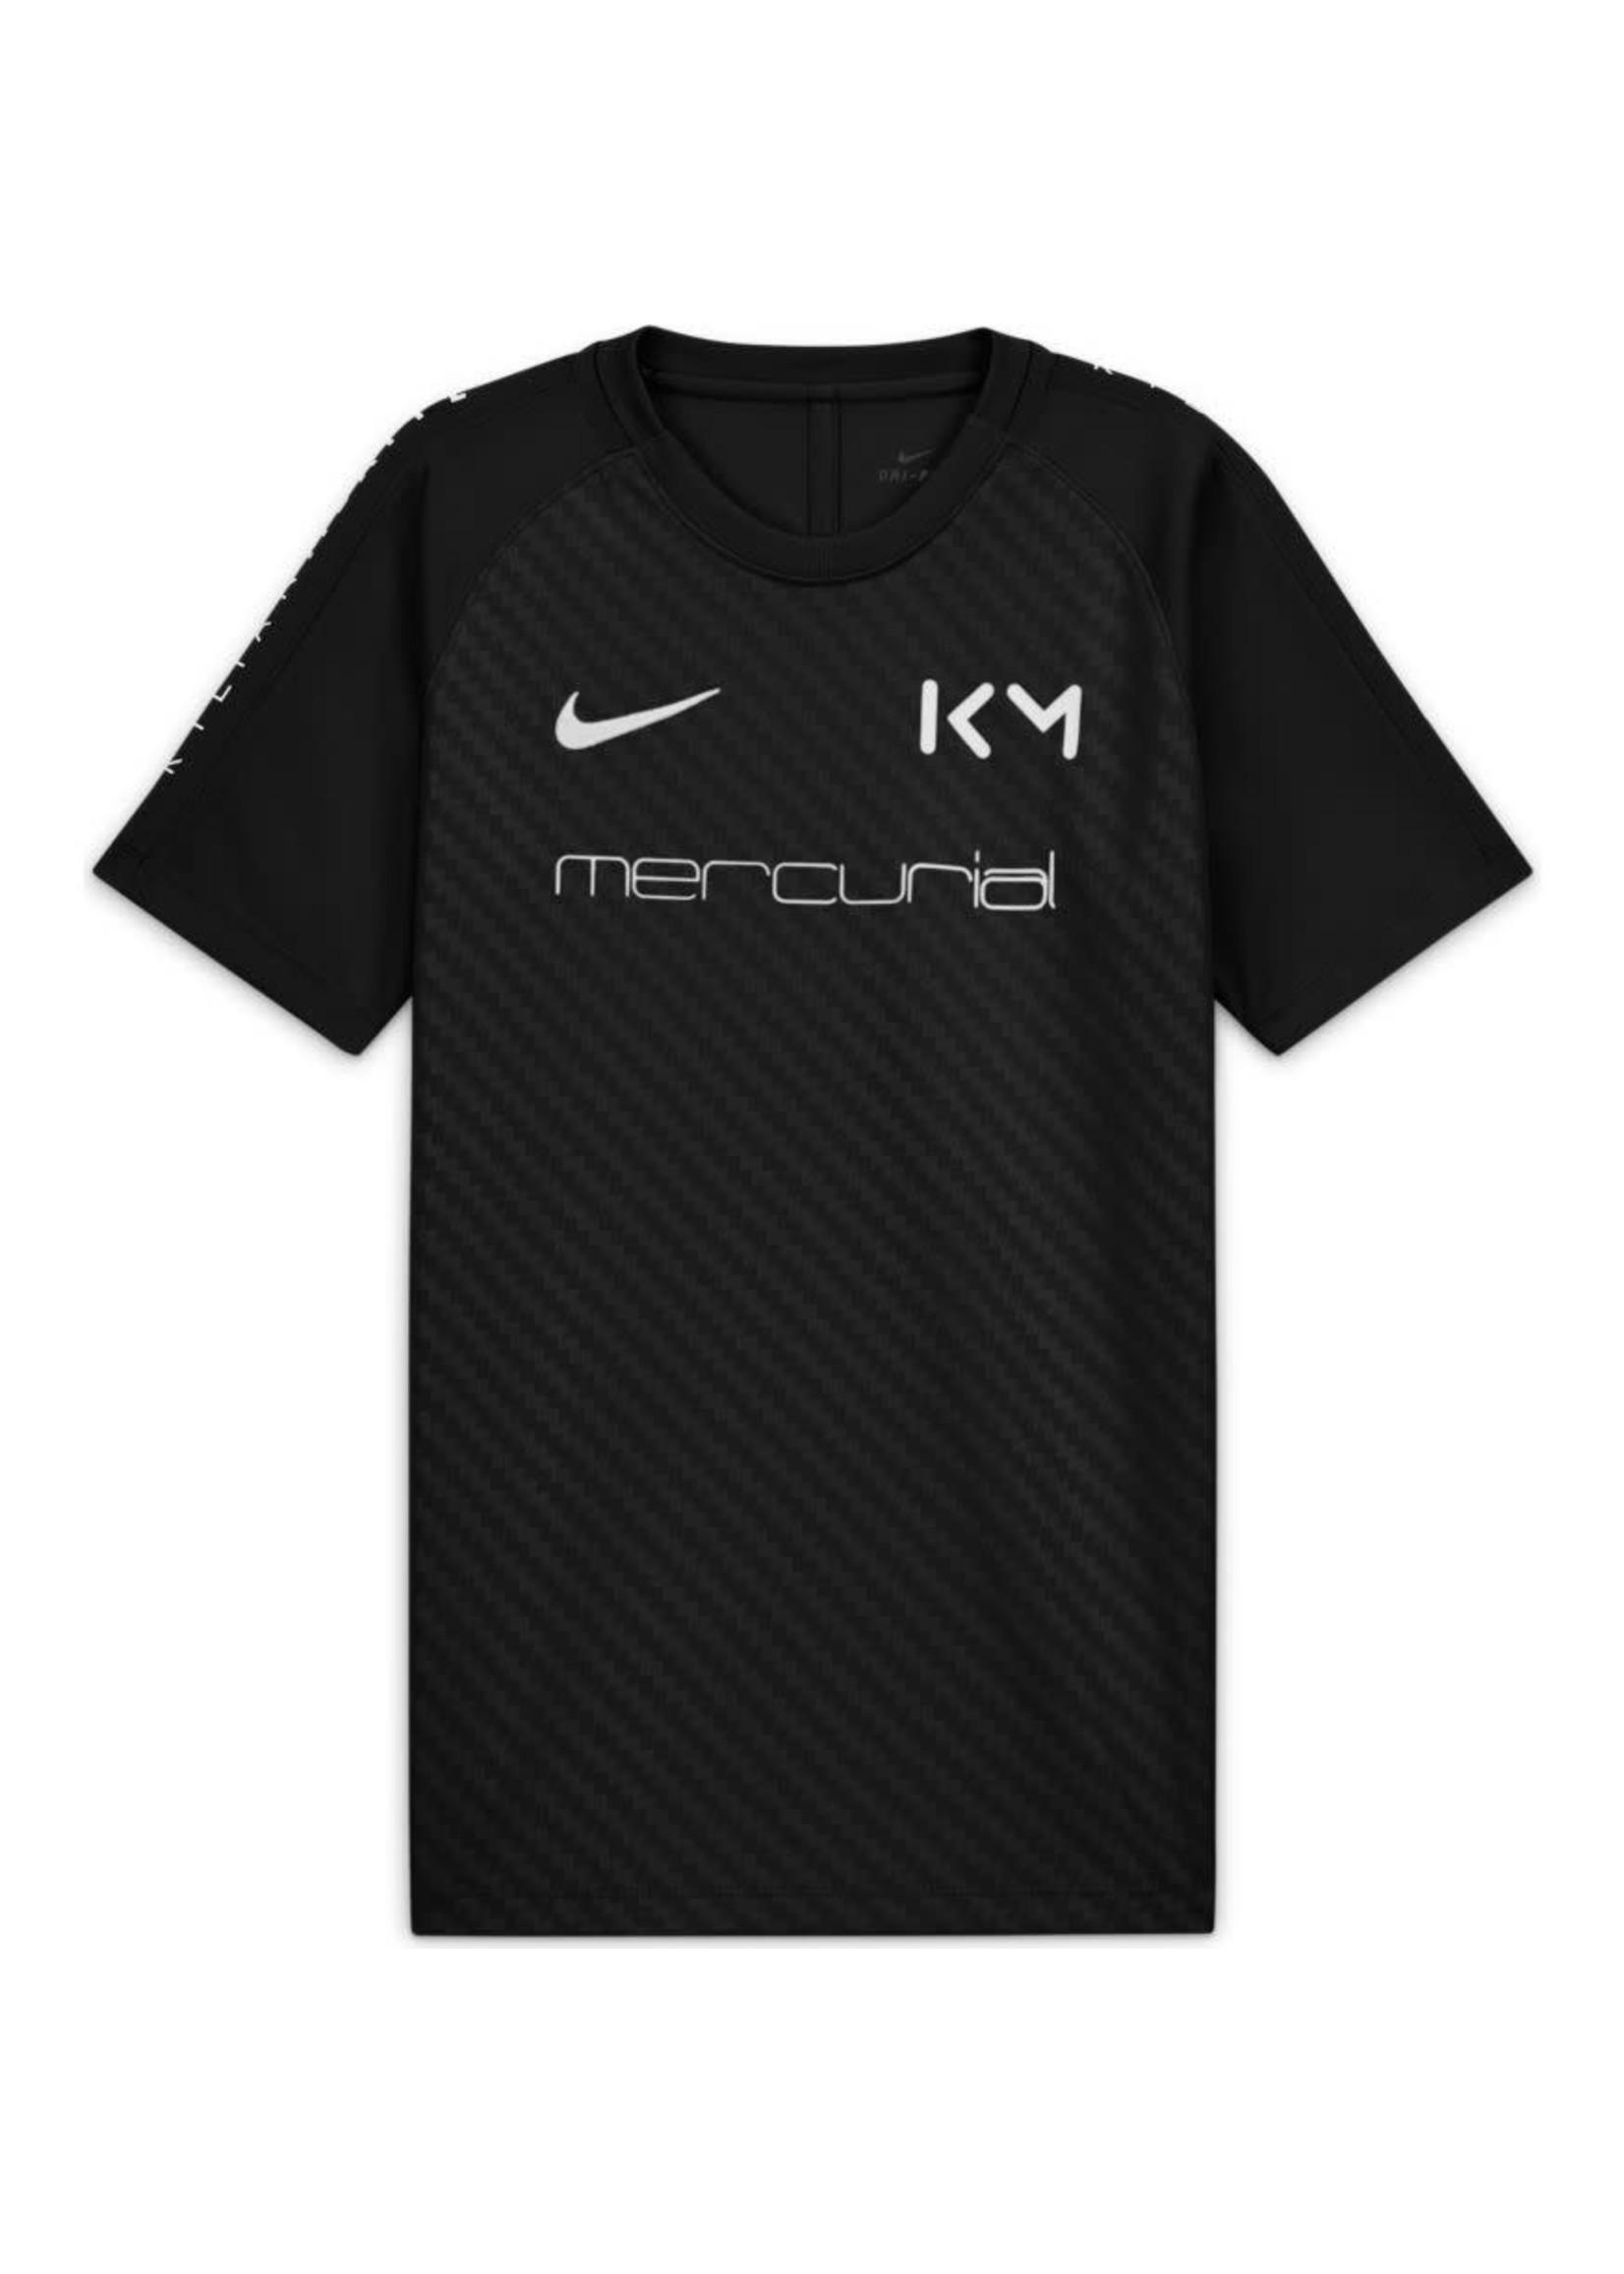 Nike Kylian Mbappe Mercurial Black Training Jersey Youth